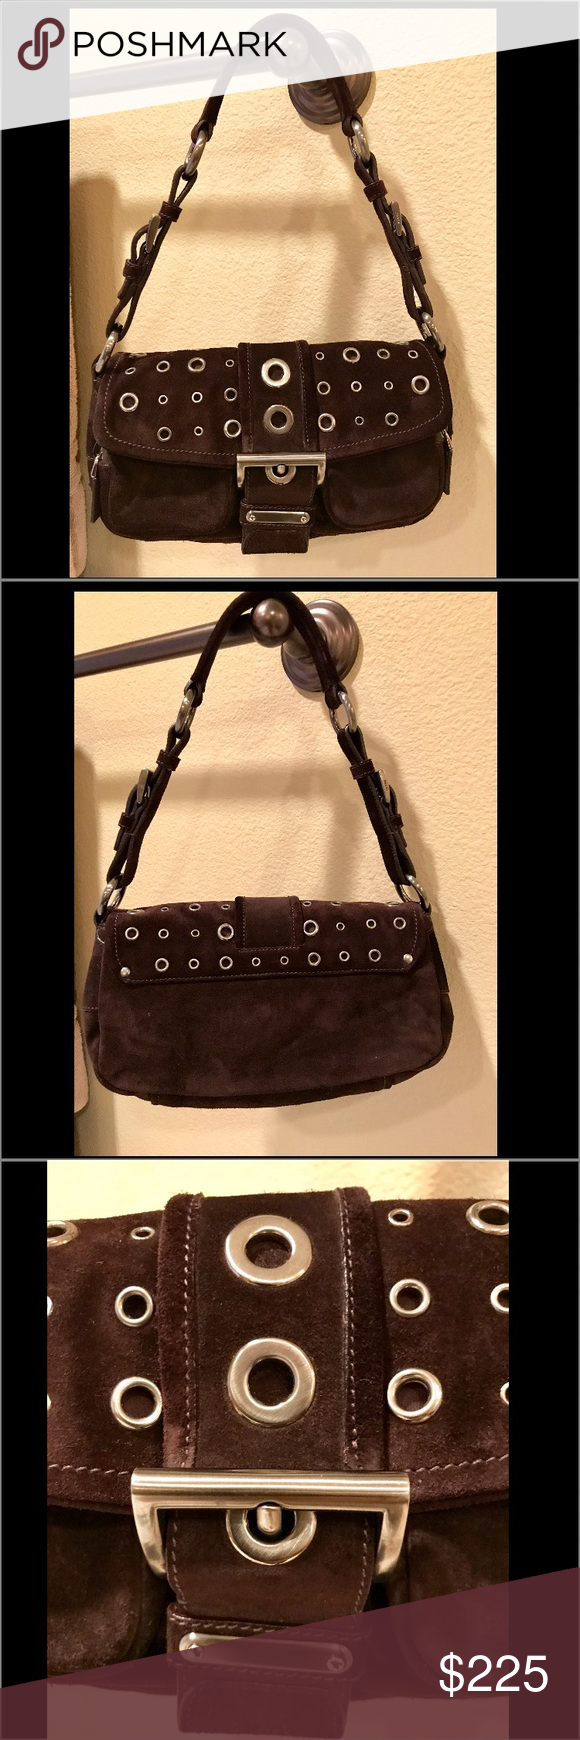 NWOT Authetic Prada mini suede purse with dust bag NWOT Authetic Prada  espresso brown mini suede purse with dust bag. Absolutely gorgeous! Prada  Bags Mini ... b82c2efbb1